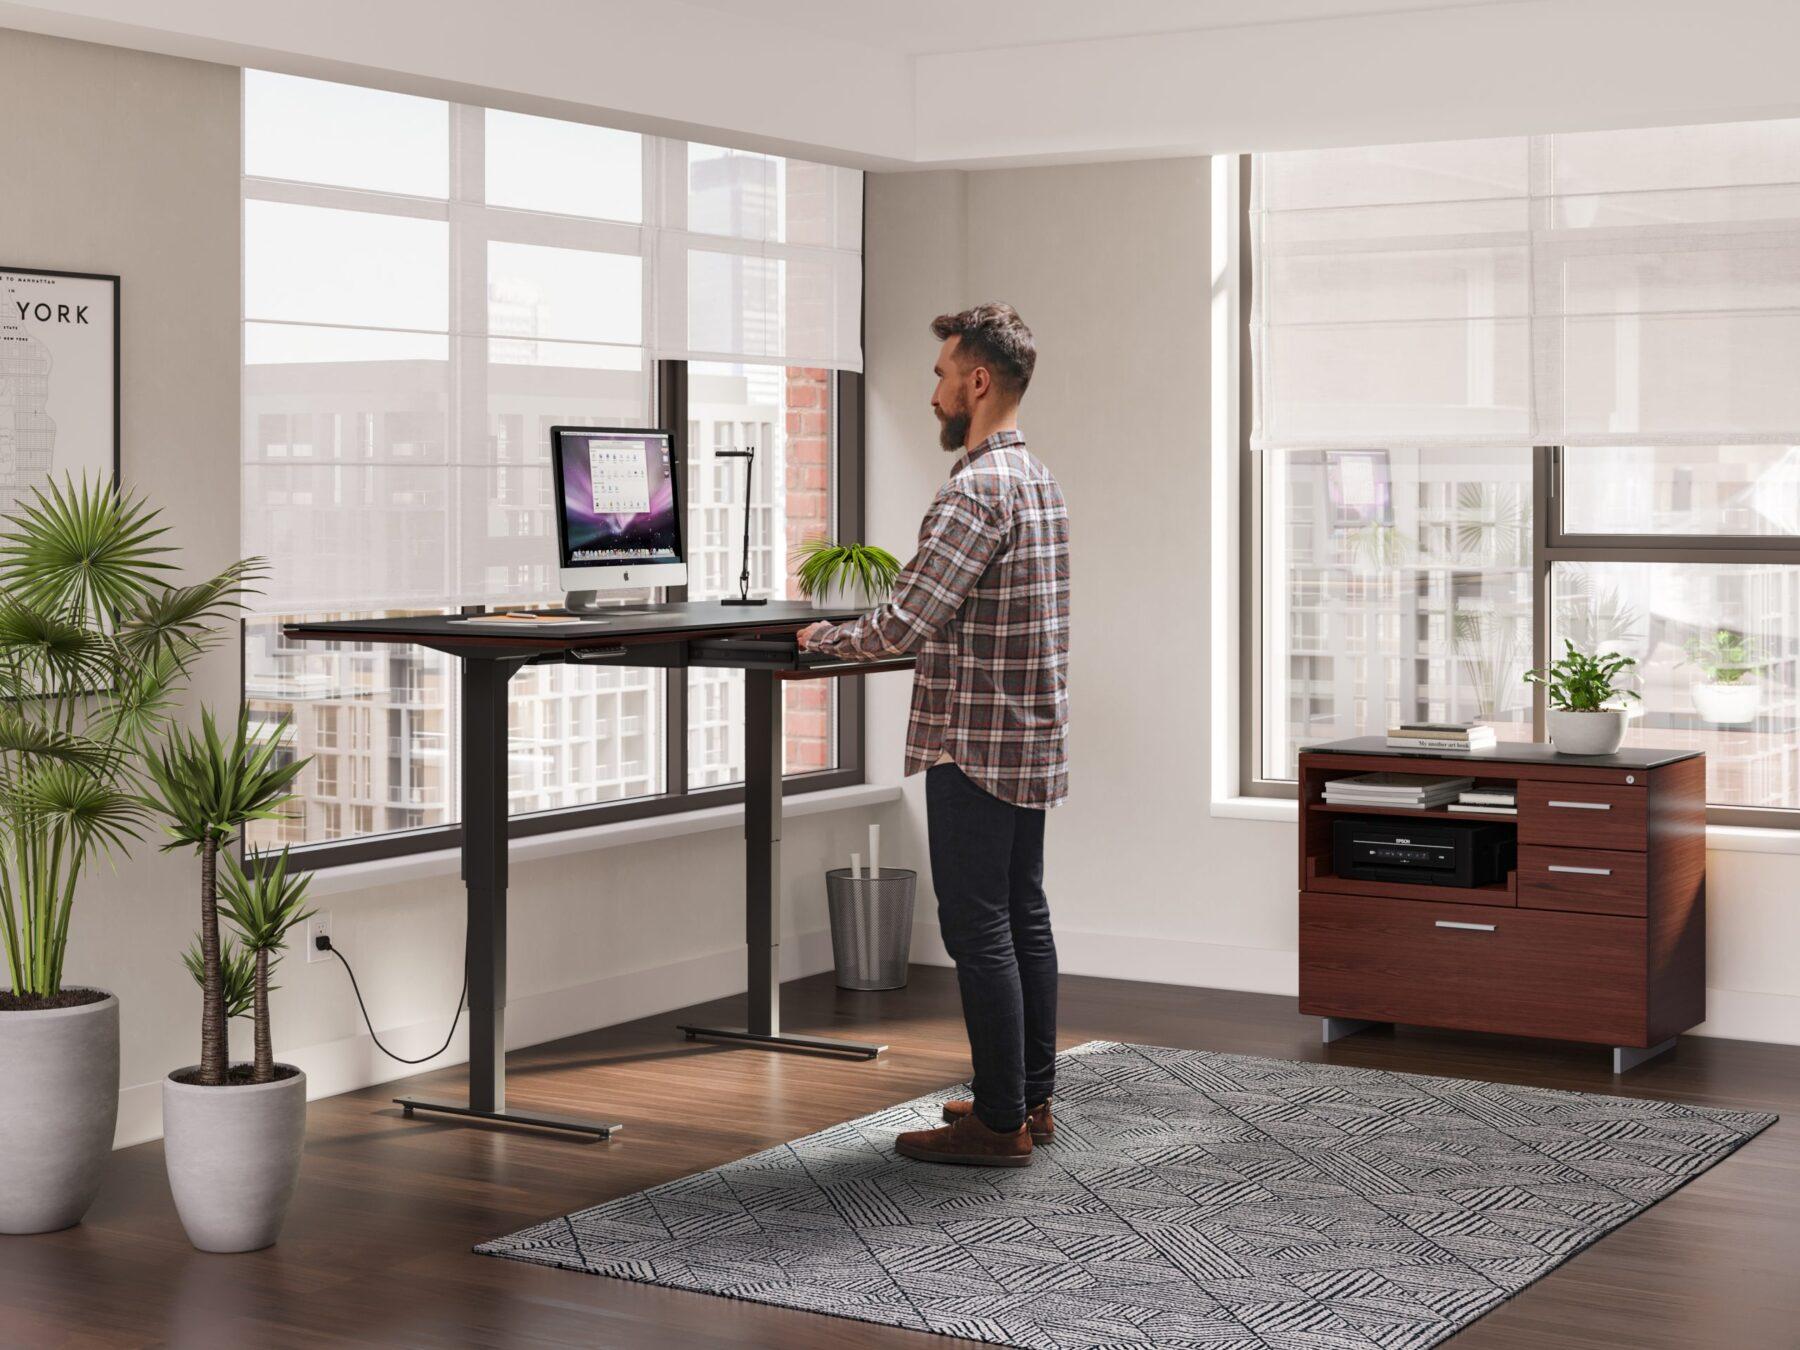 sequel office 6151 6159 lift desk 6117 multifunction storage cwl ls1